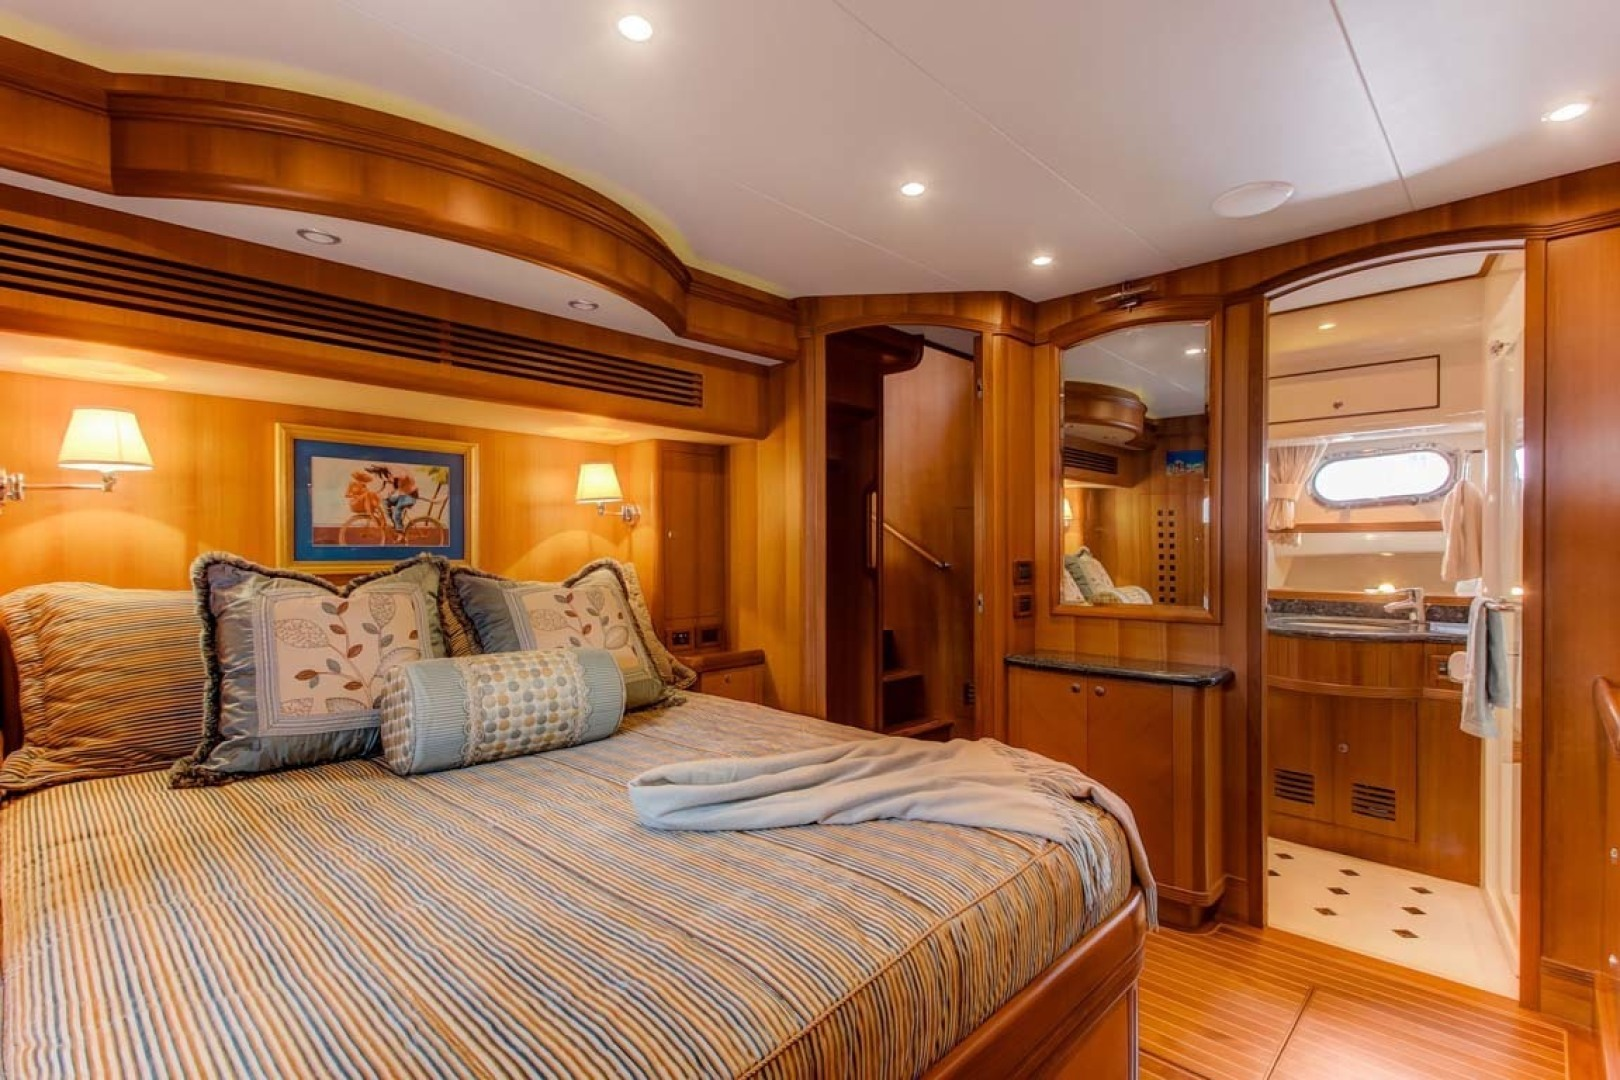 Selene-60 Ocean Trawler 2010-Gypsy Magic Jacksonville-Florida-United States-Master Stateroom-1346751   Thumbnail